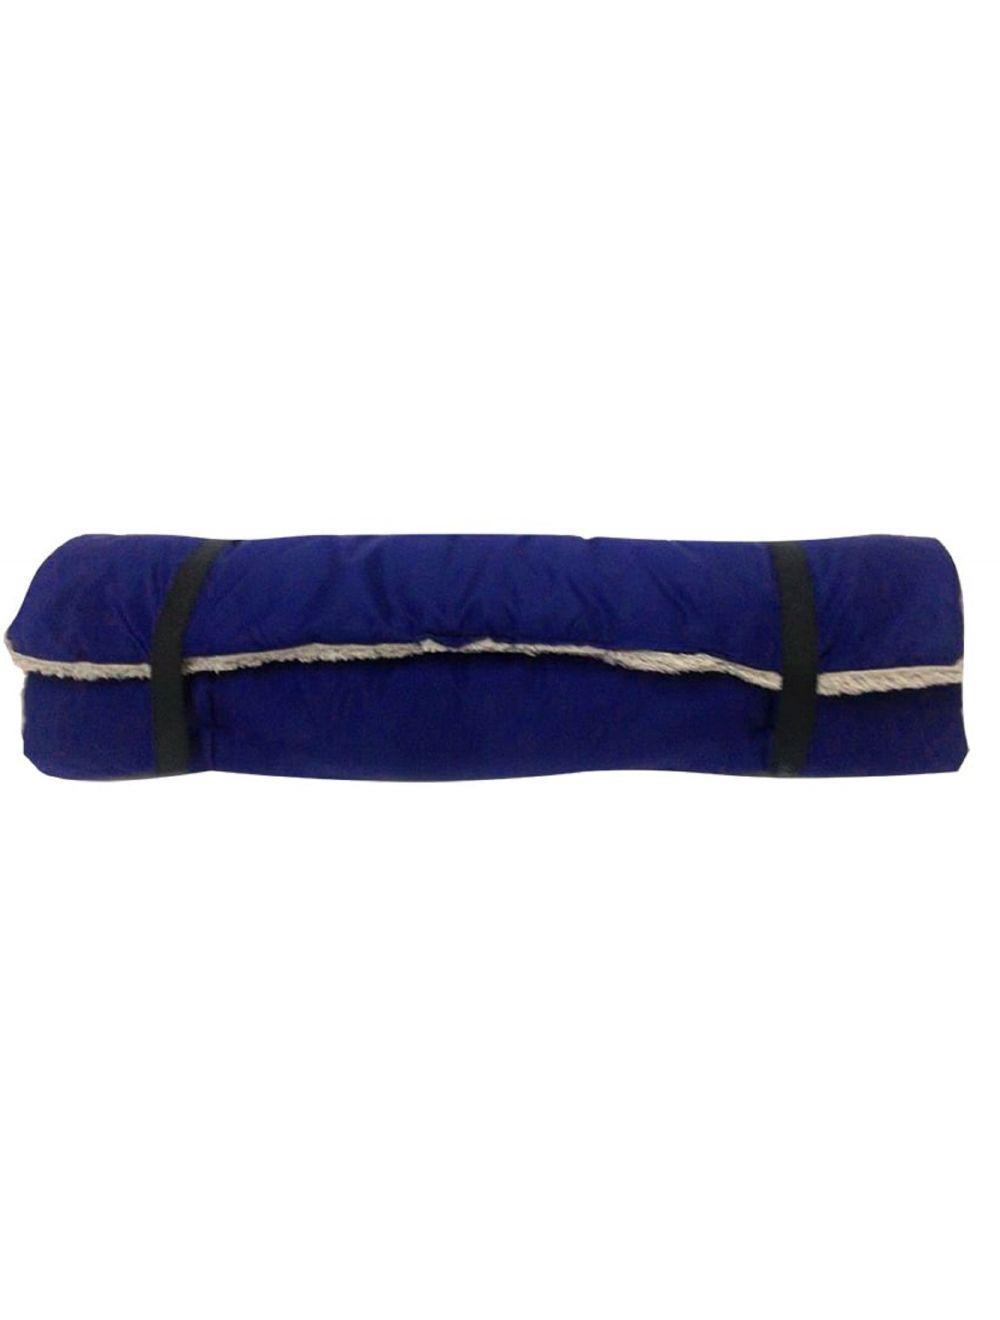 Border cama para perro portatil talla M